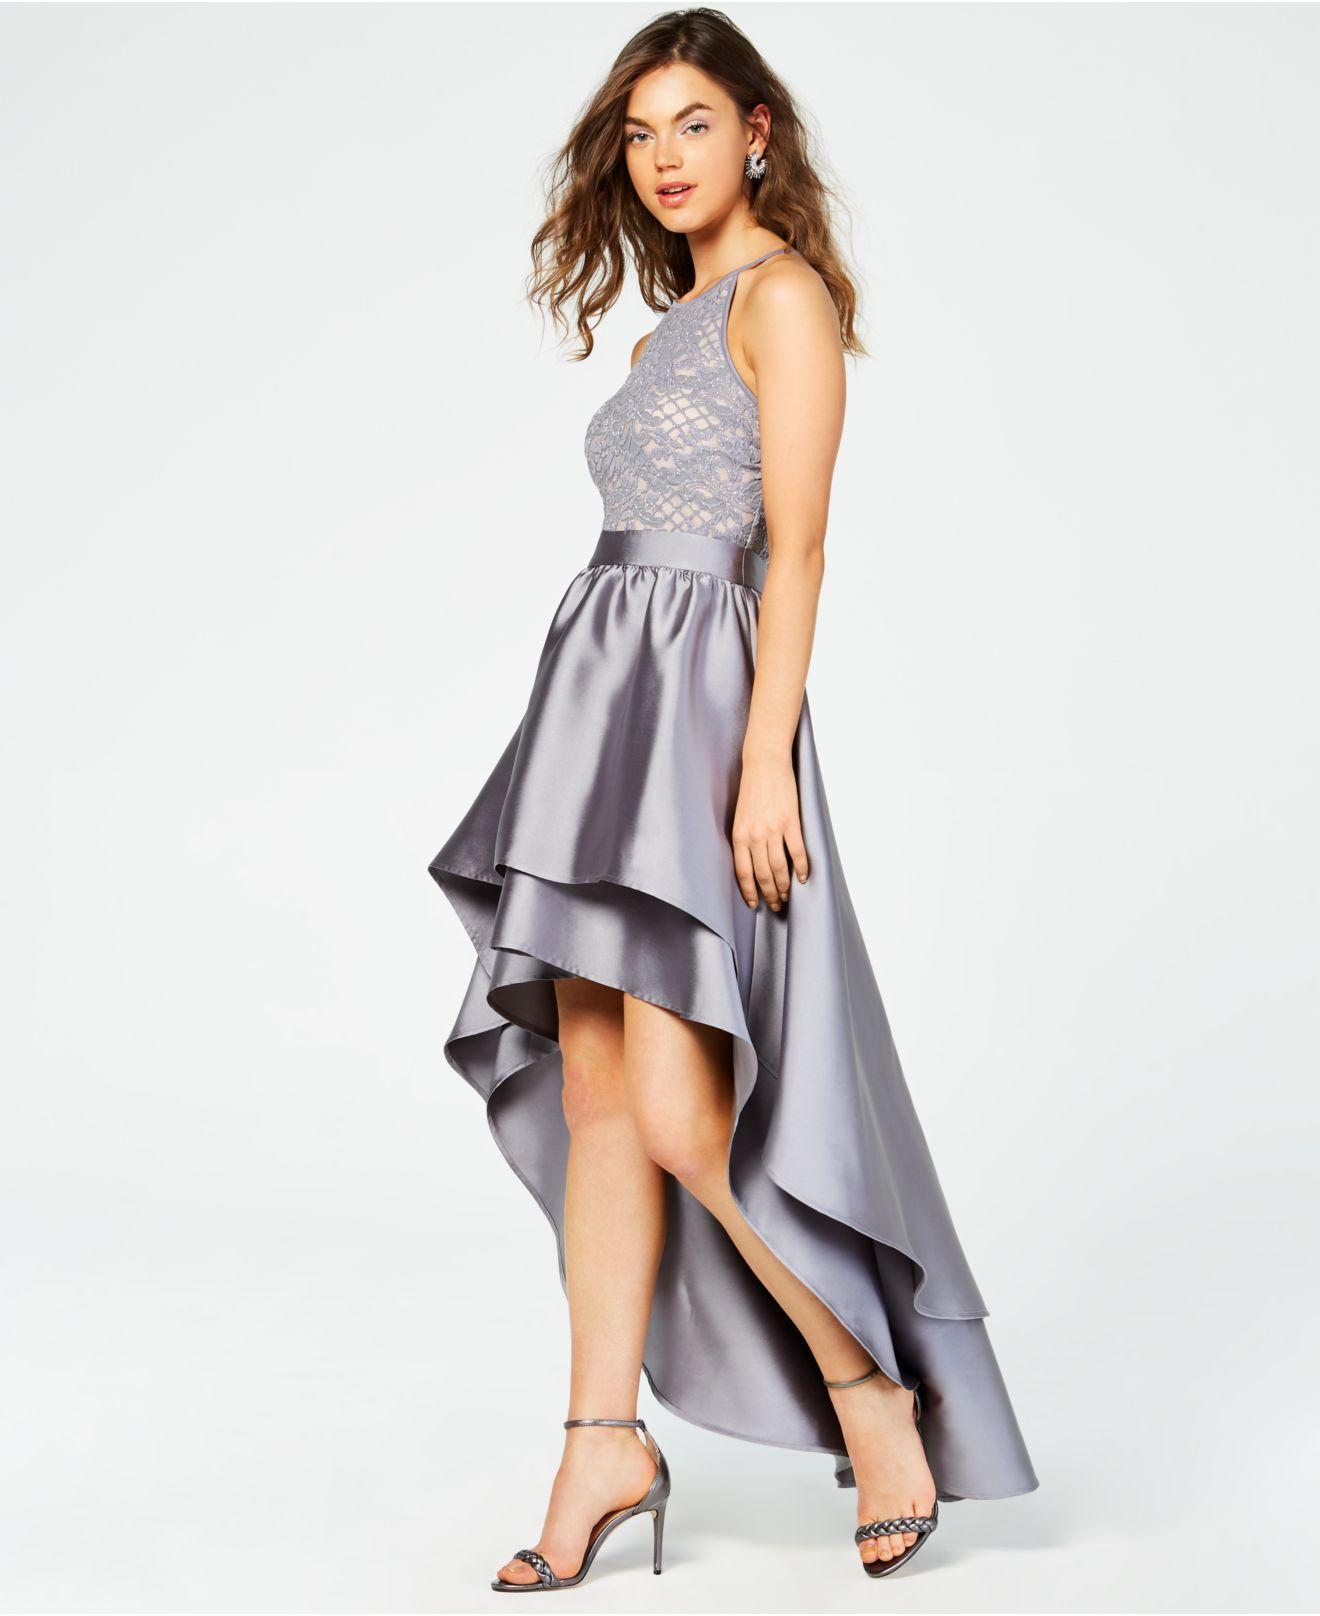 4e16bcec8aa Macys Junior Plus Size Dresses - Gomes Weine AG